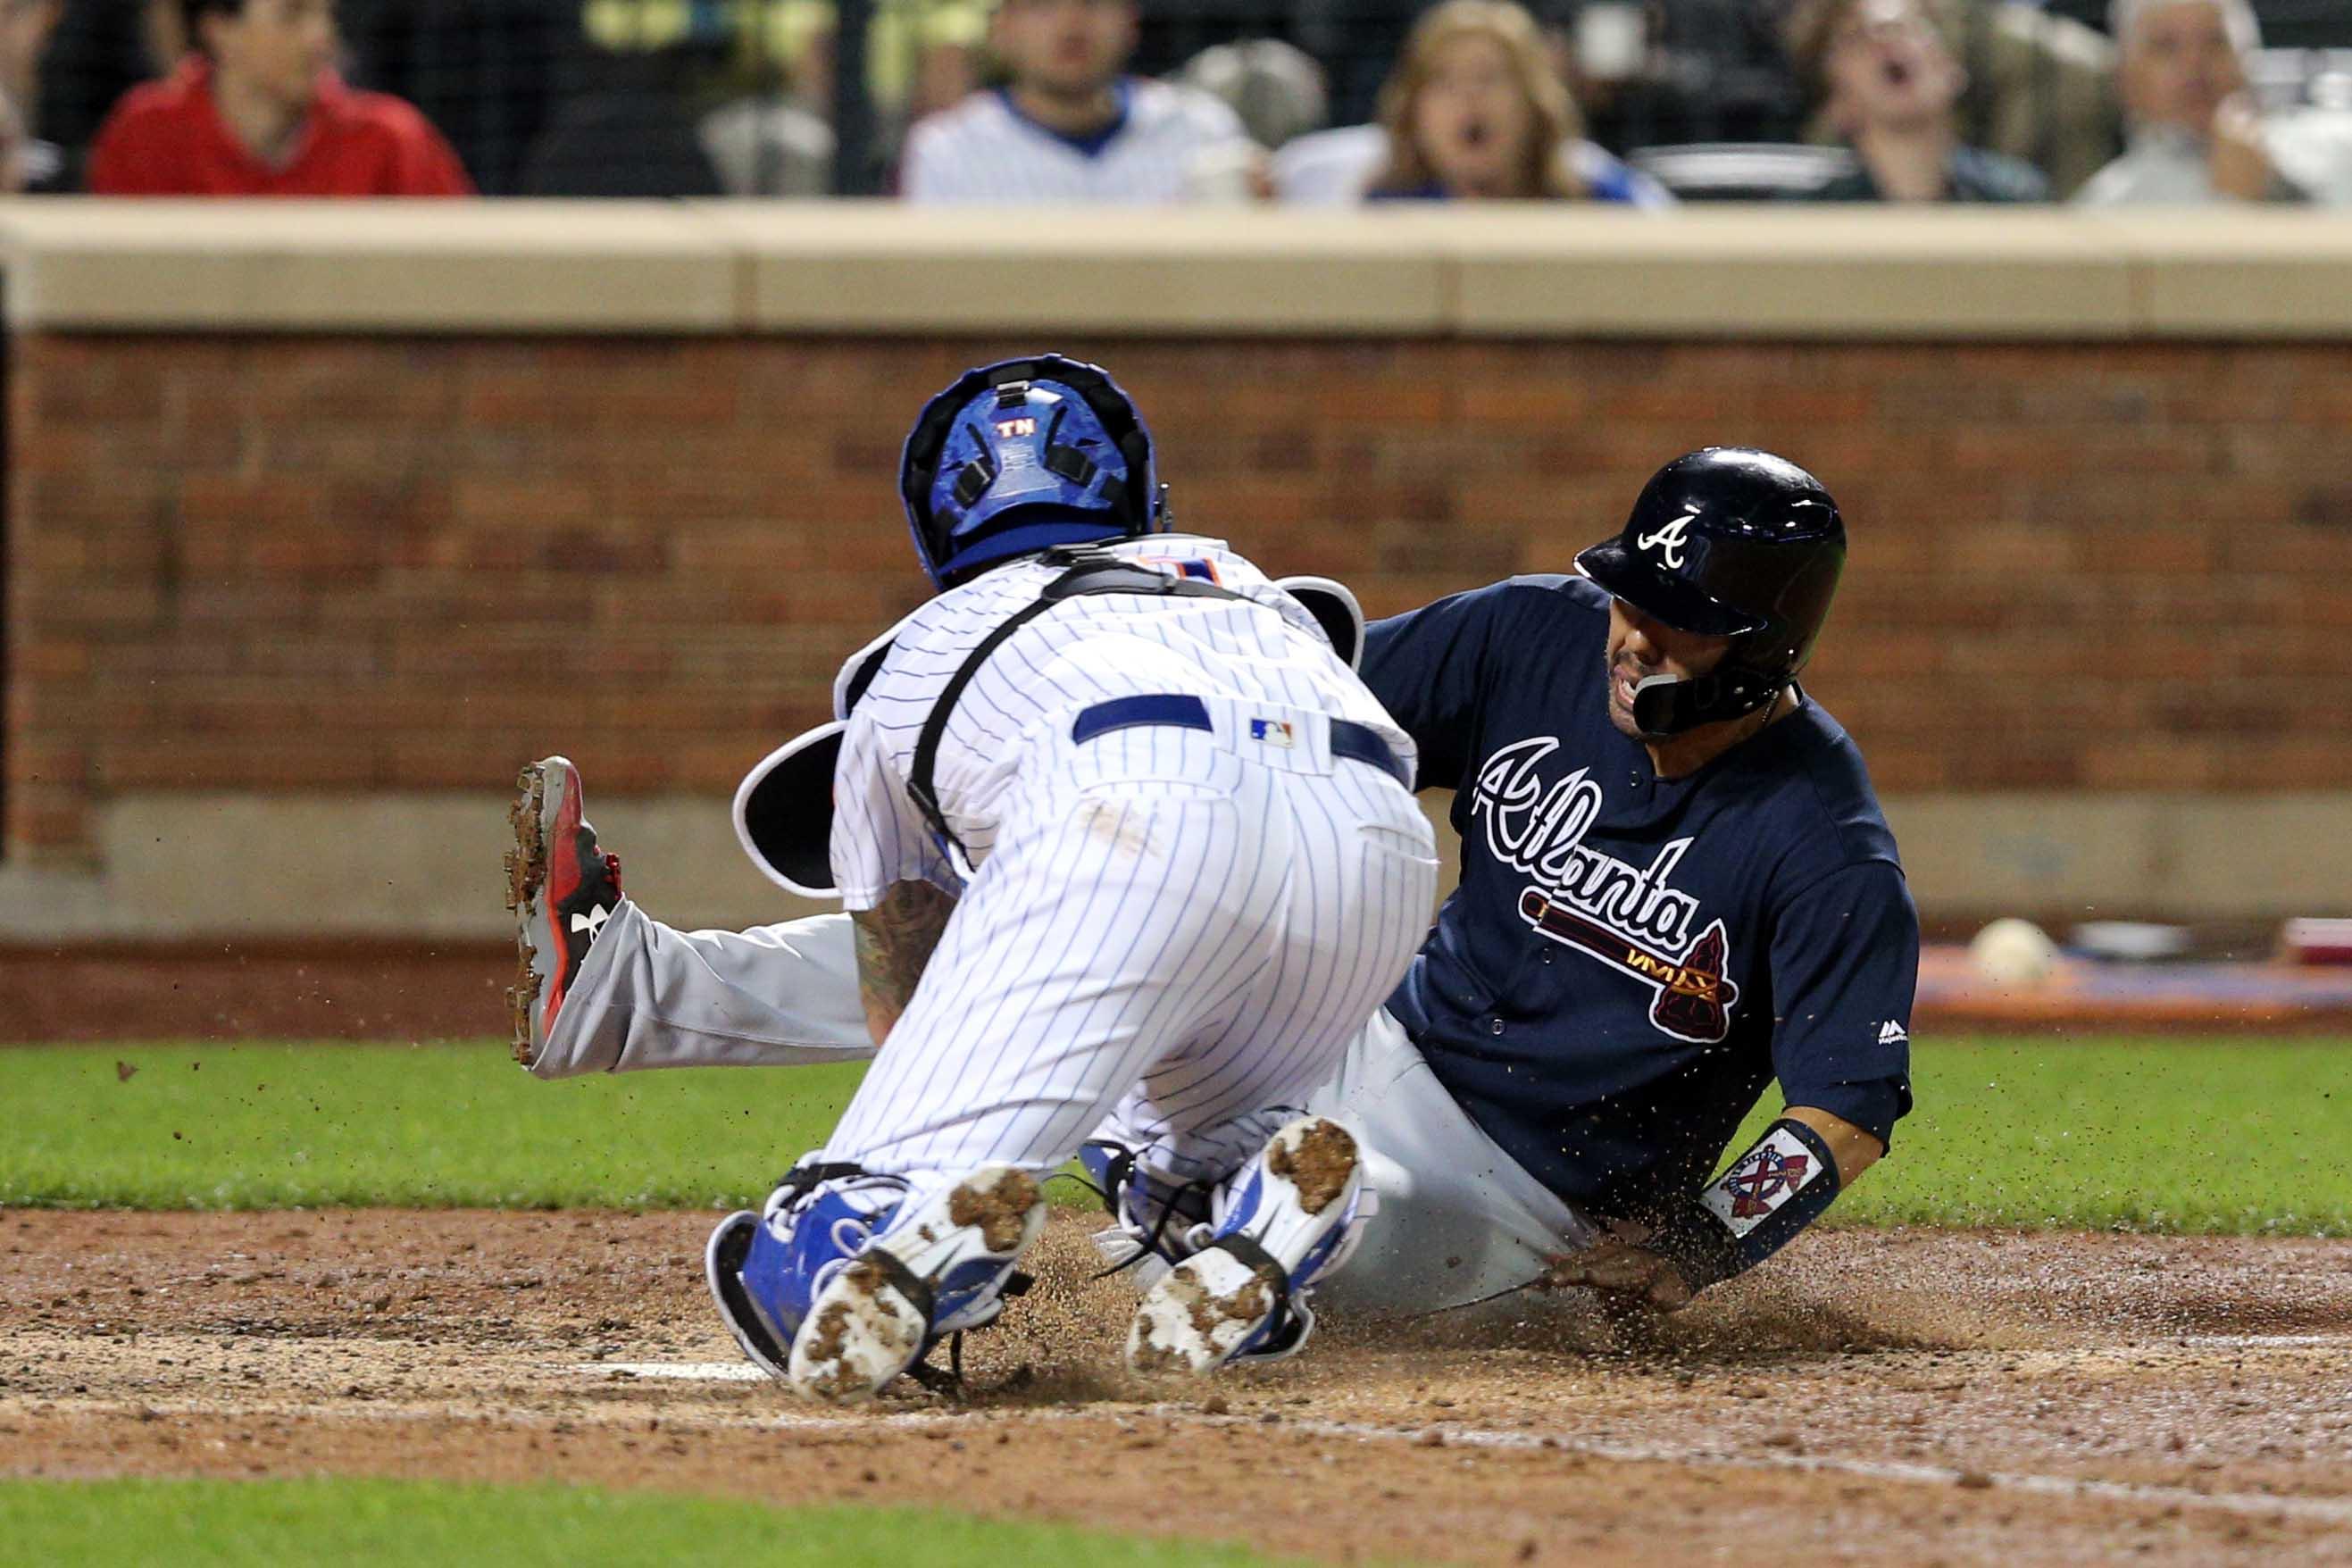 5/2/18 Game Preview: Atlanta Braves at New York Mets